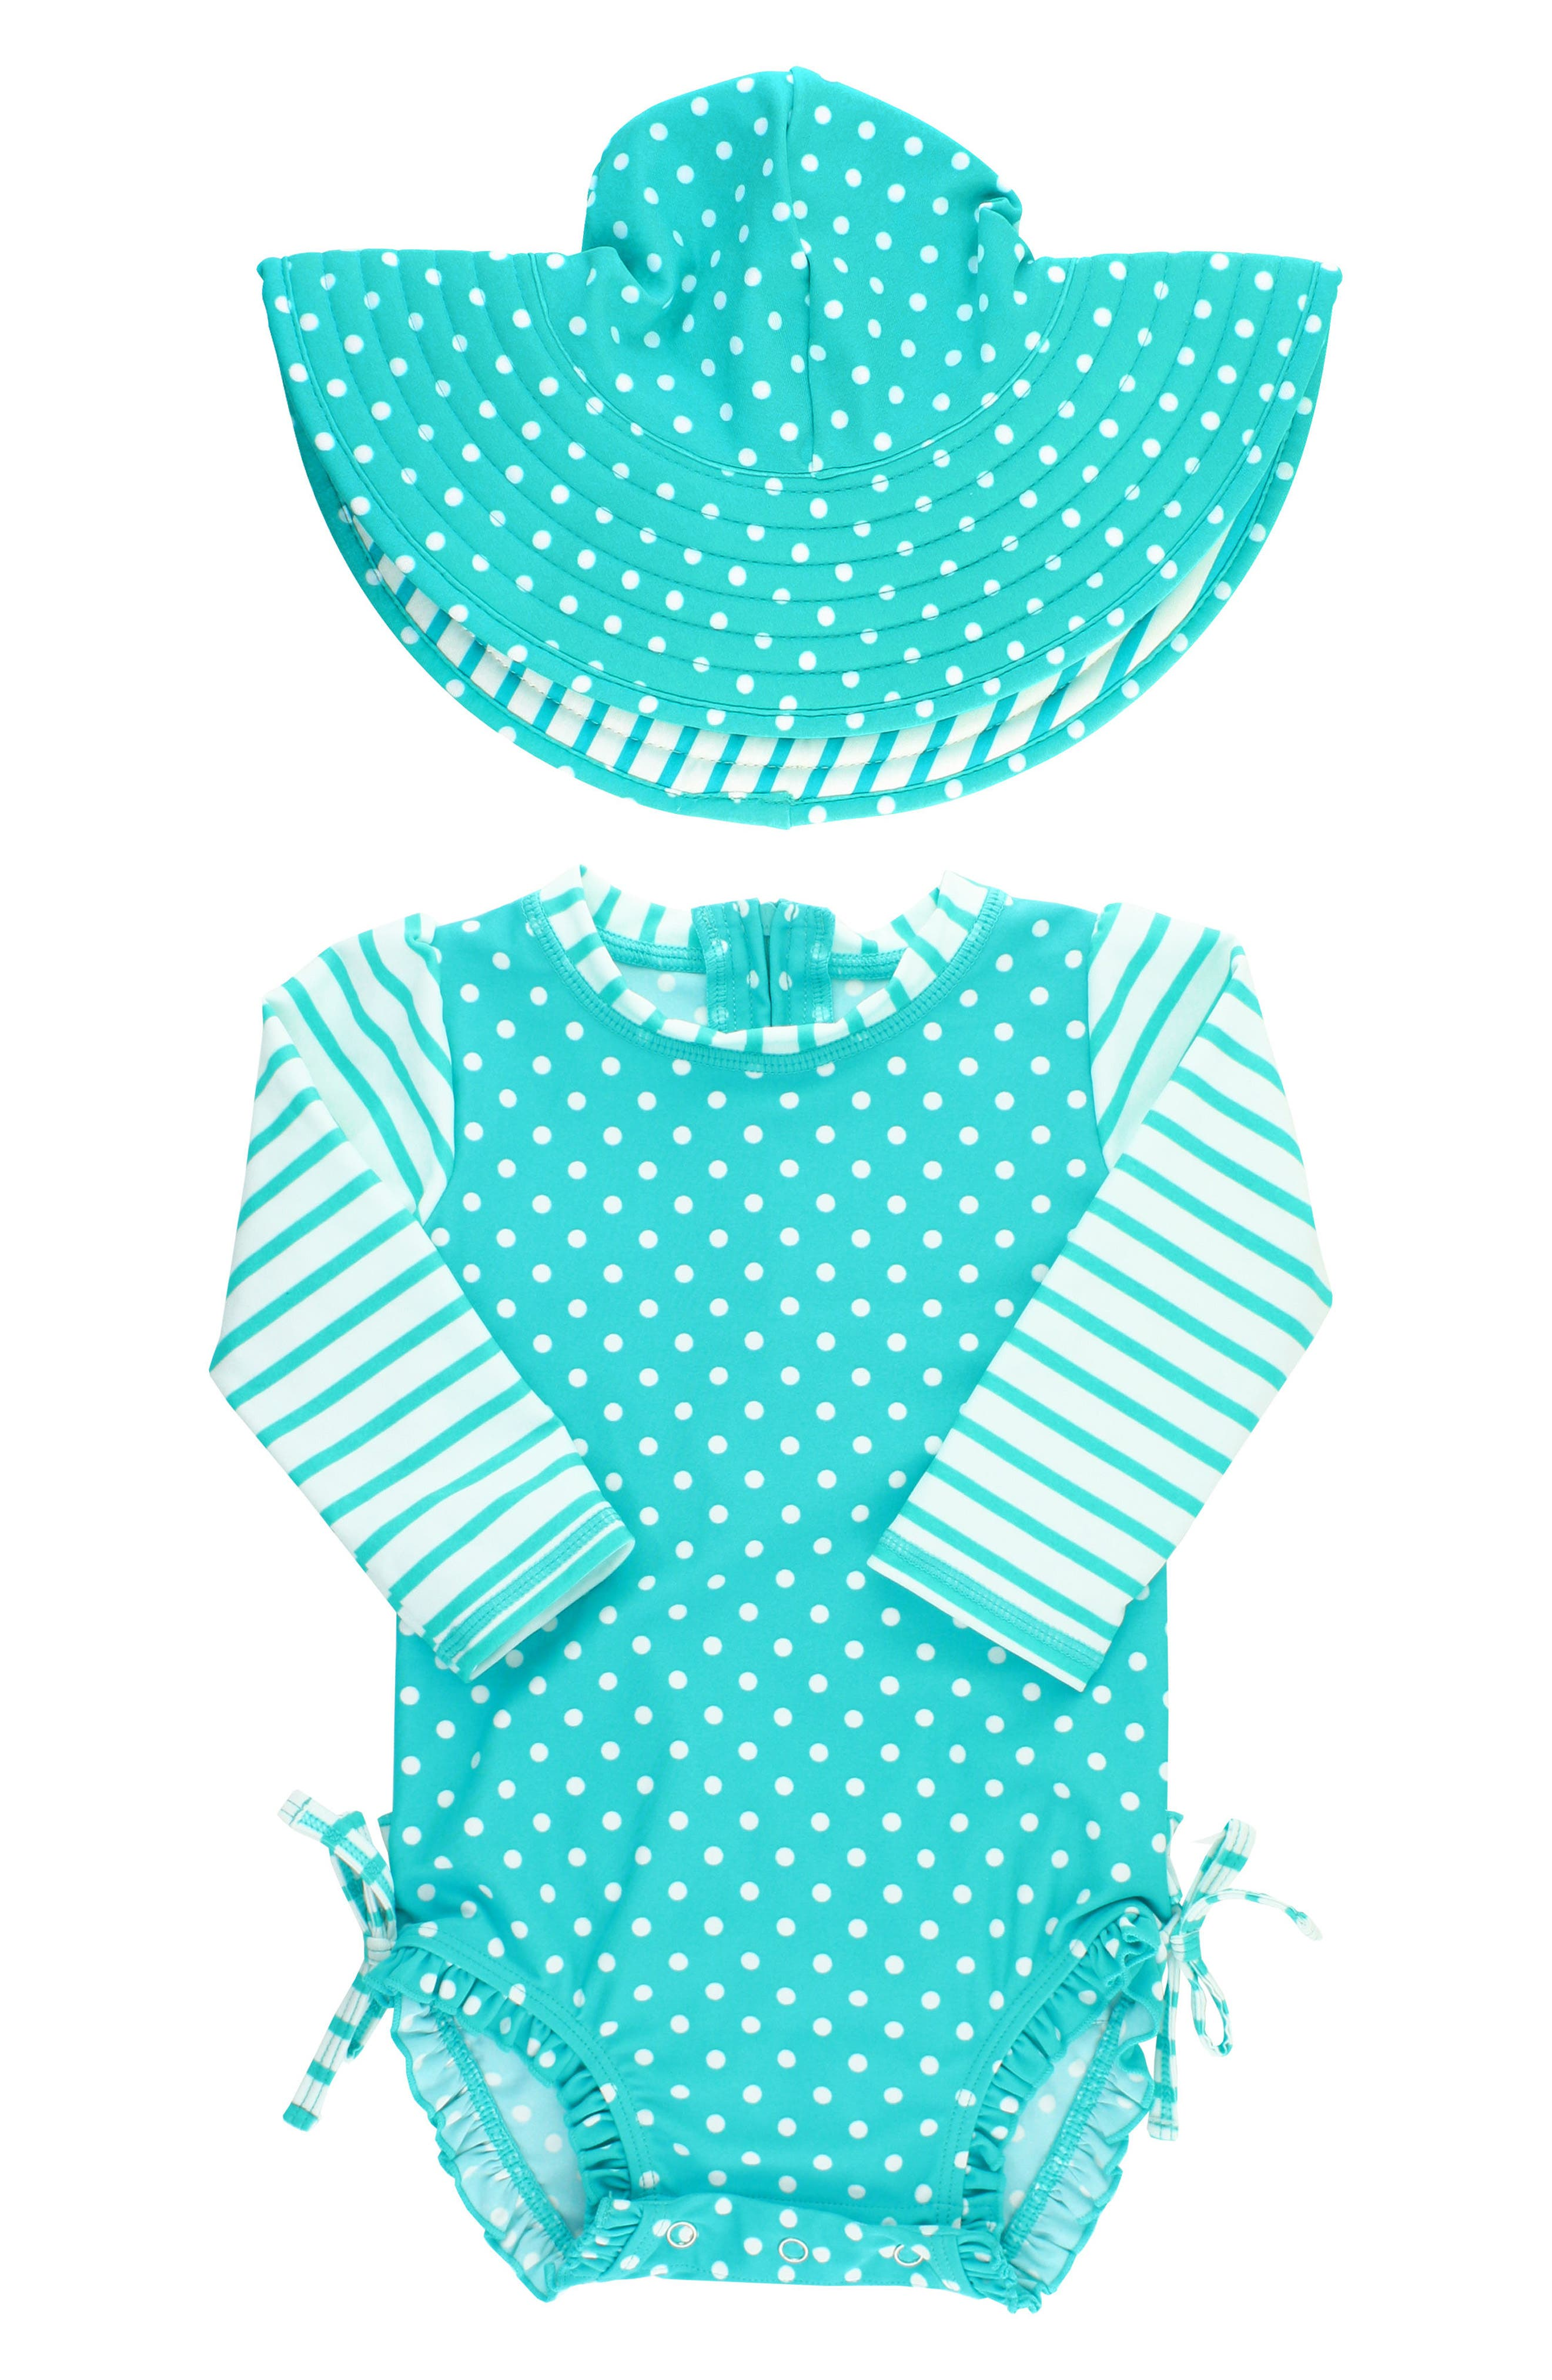 Main Image - RuffleButts One-Piece Rashguard Swimsuit & Hat Set (Baby Girls)